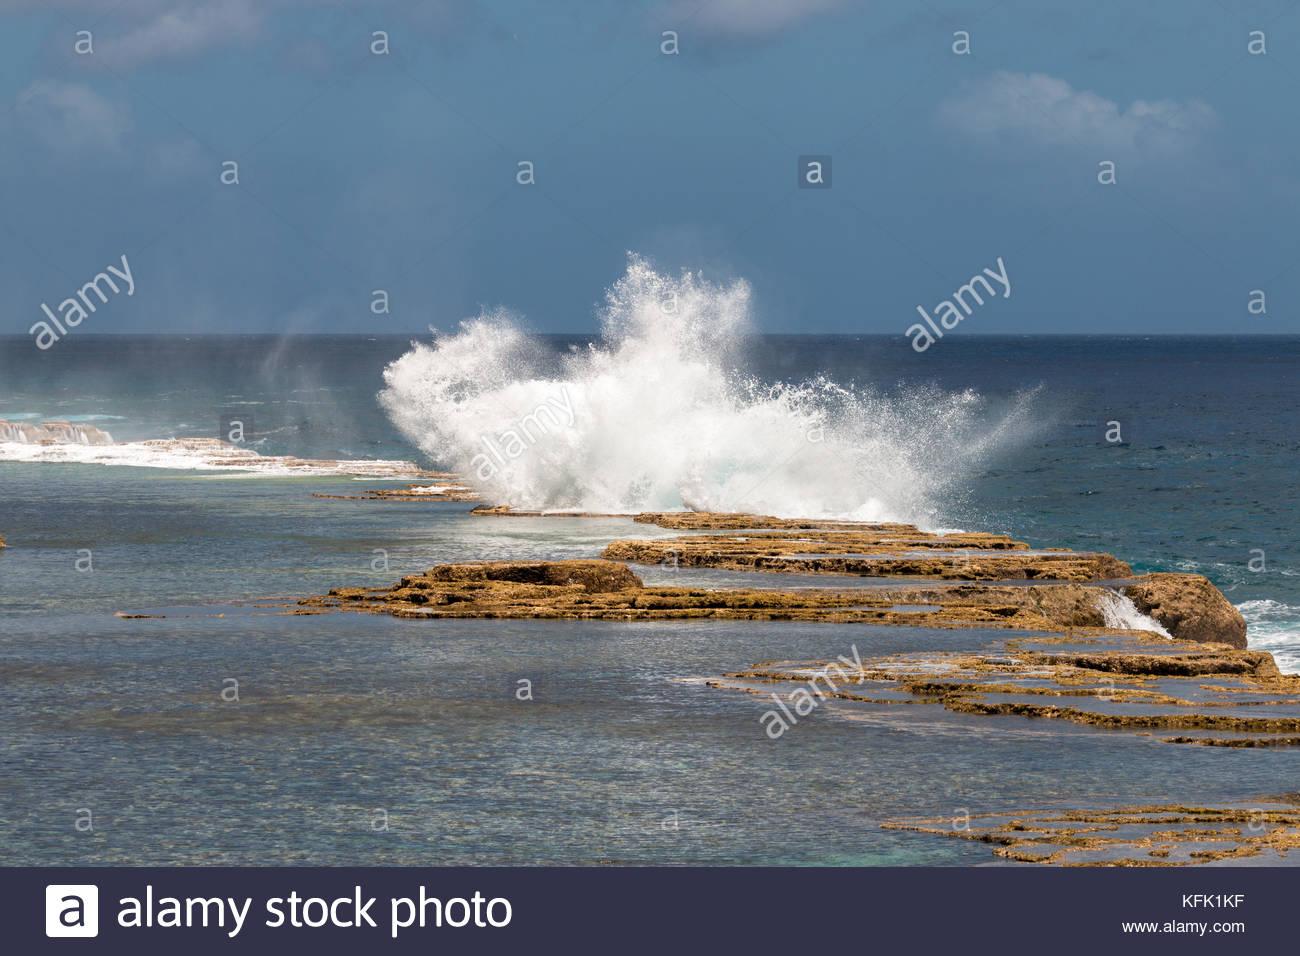 Splash de Mapu'a 'vaea aventadores, tongatapu, Tonga Imagen De Stock